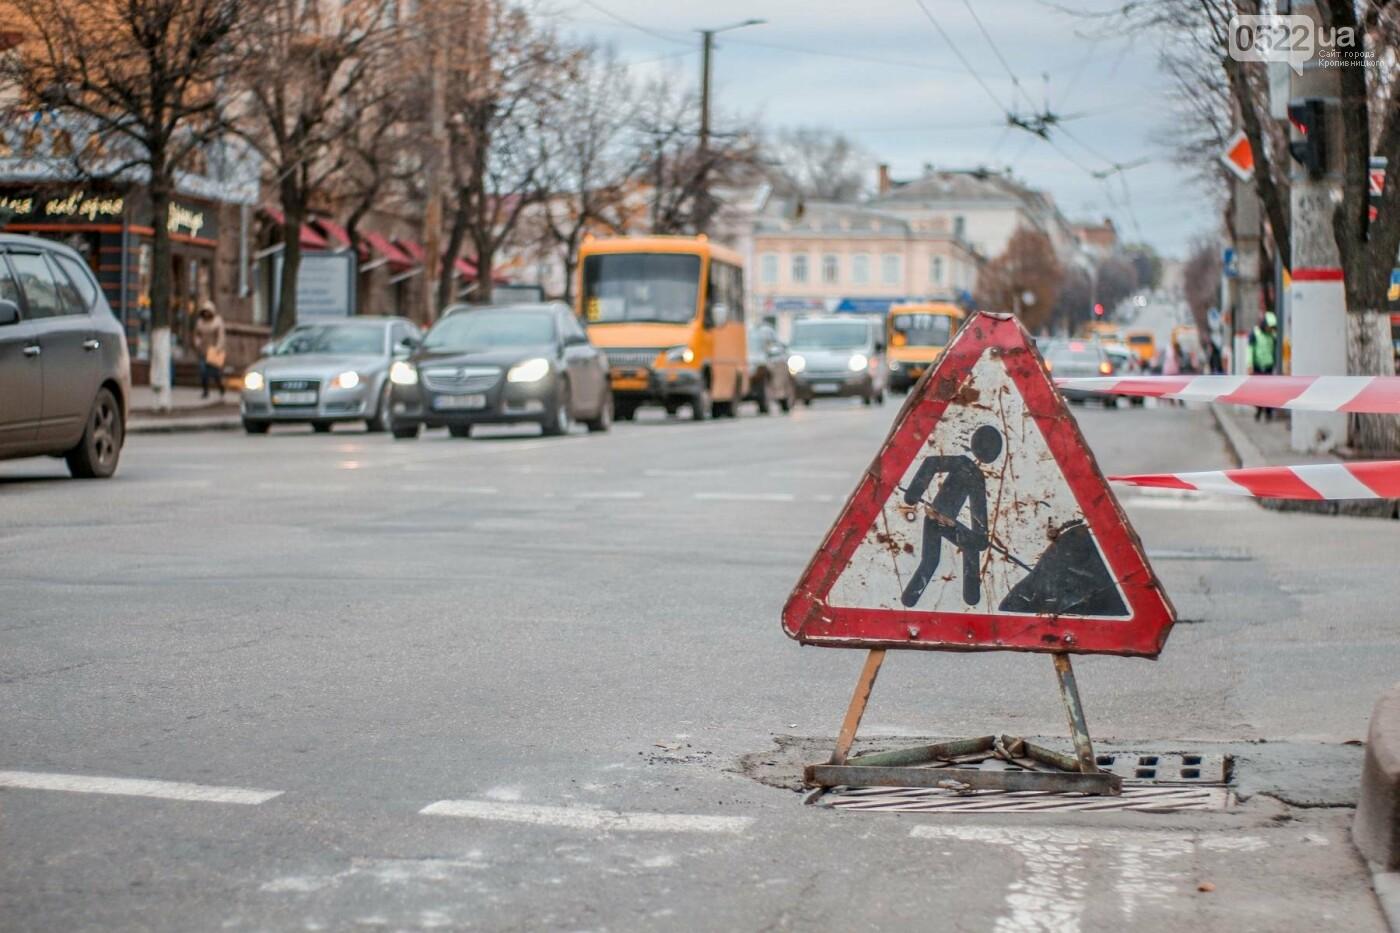 Листопад у Кропивницькому (Фото), фото-7